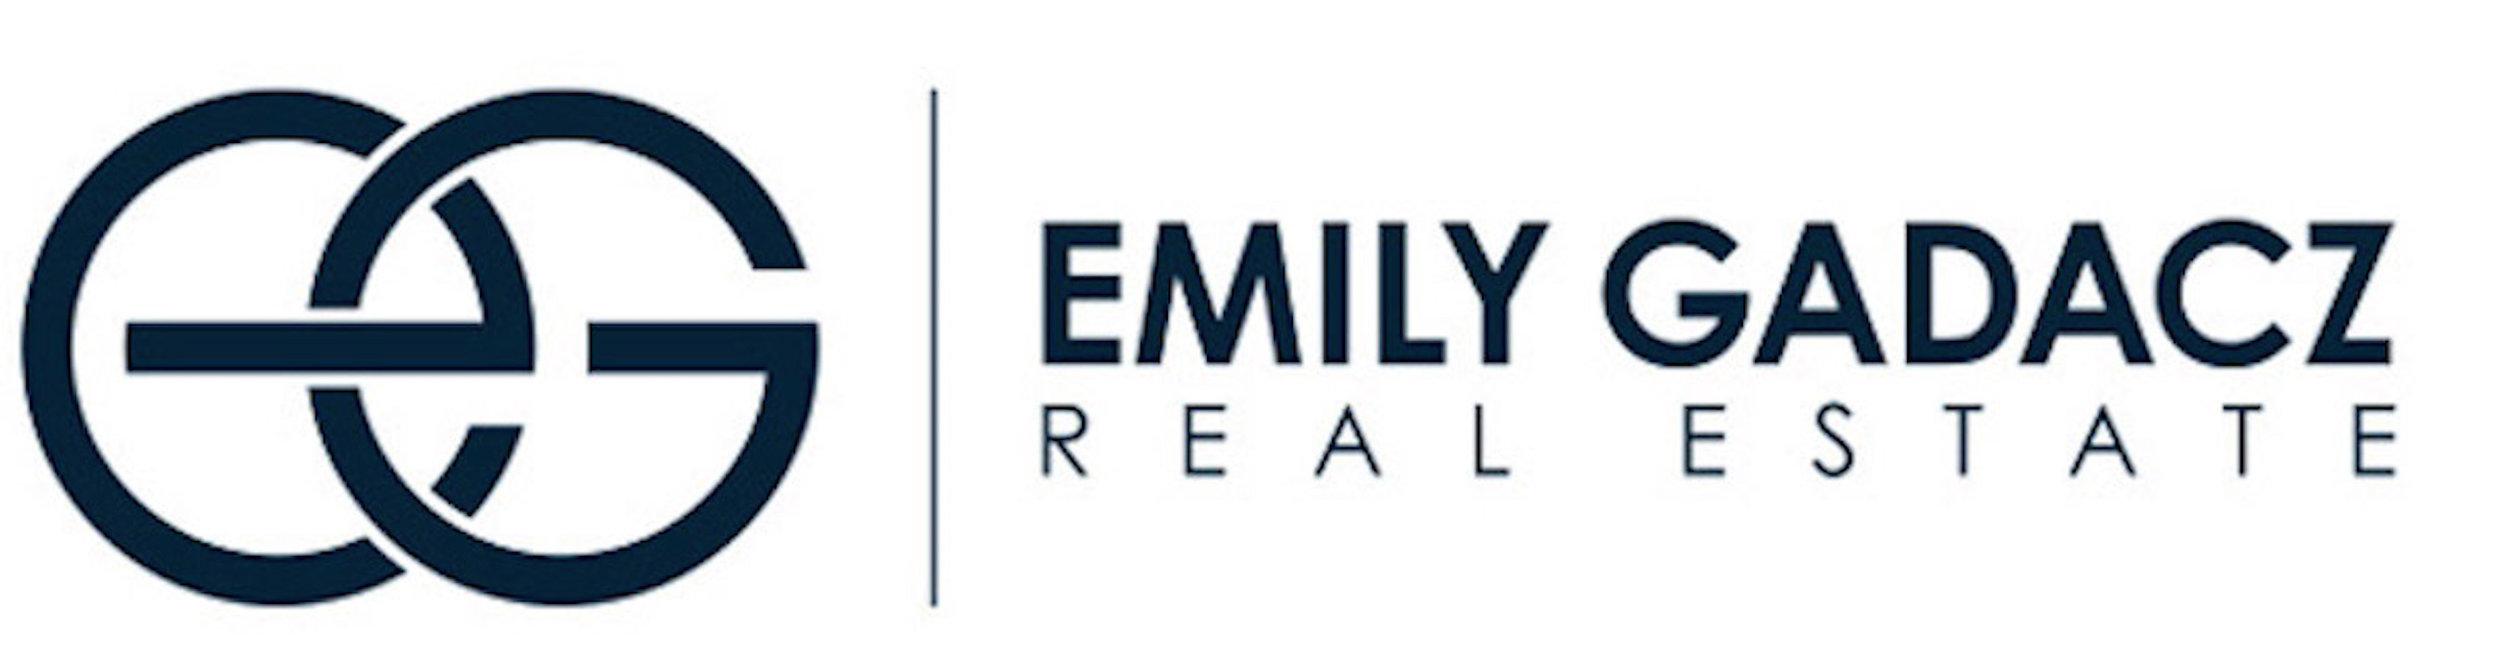 EmilyGadacz RealEstate (Logo) (1) (1).jpg